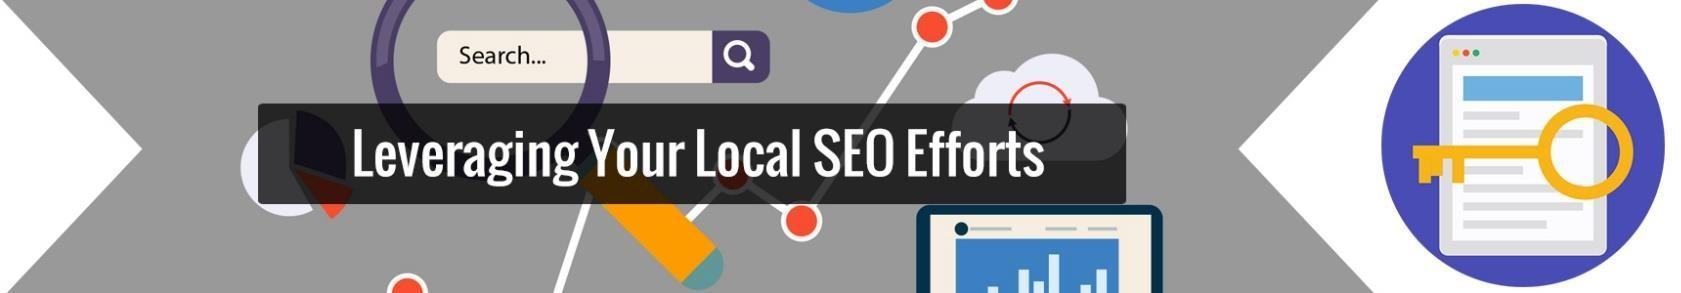 leverage local seo efforts